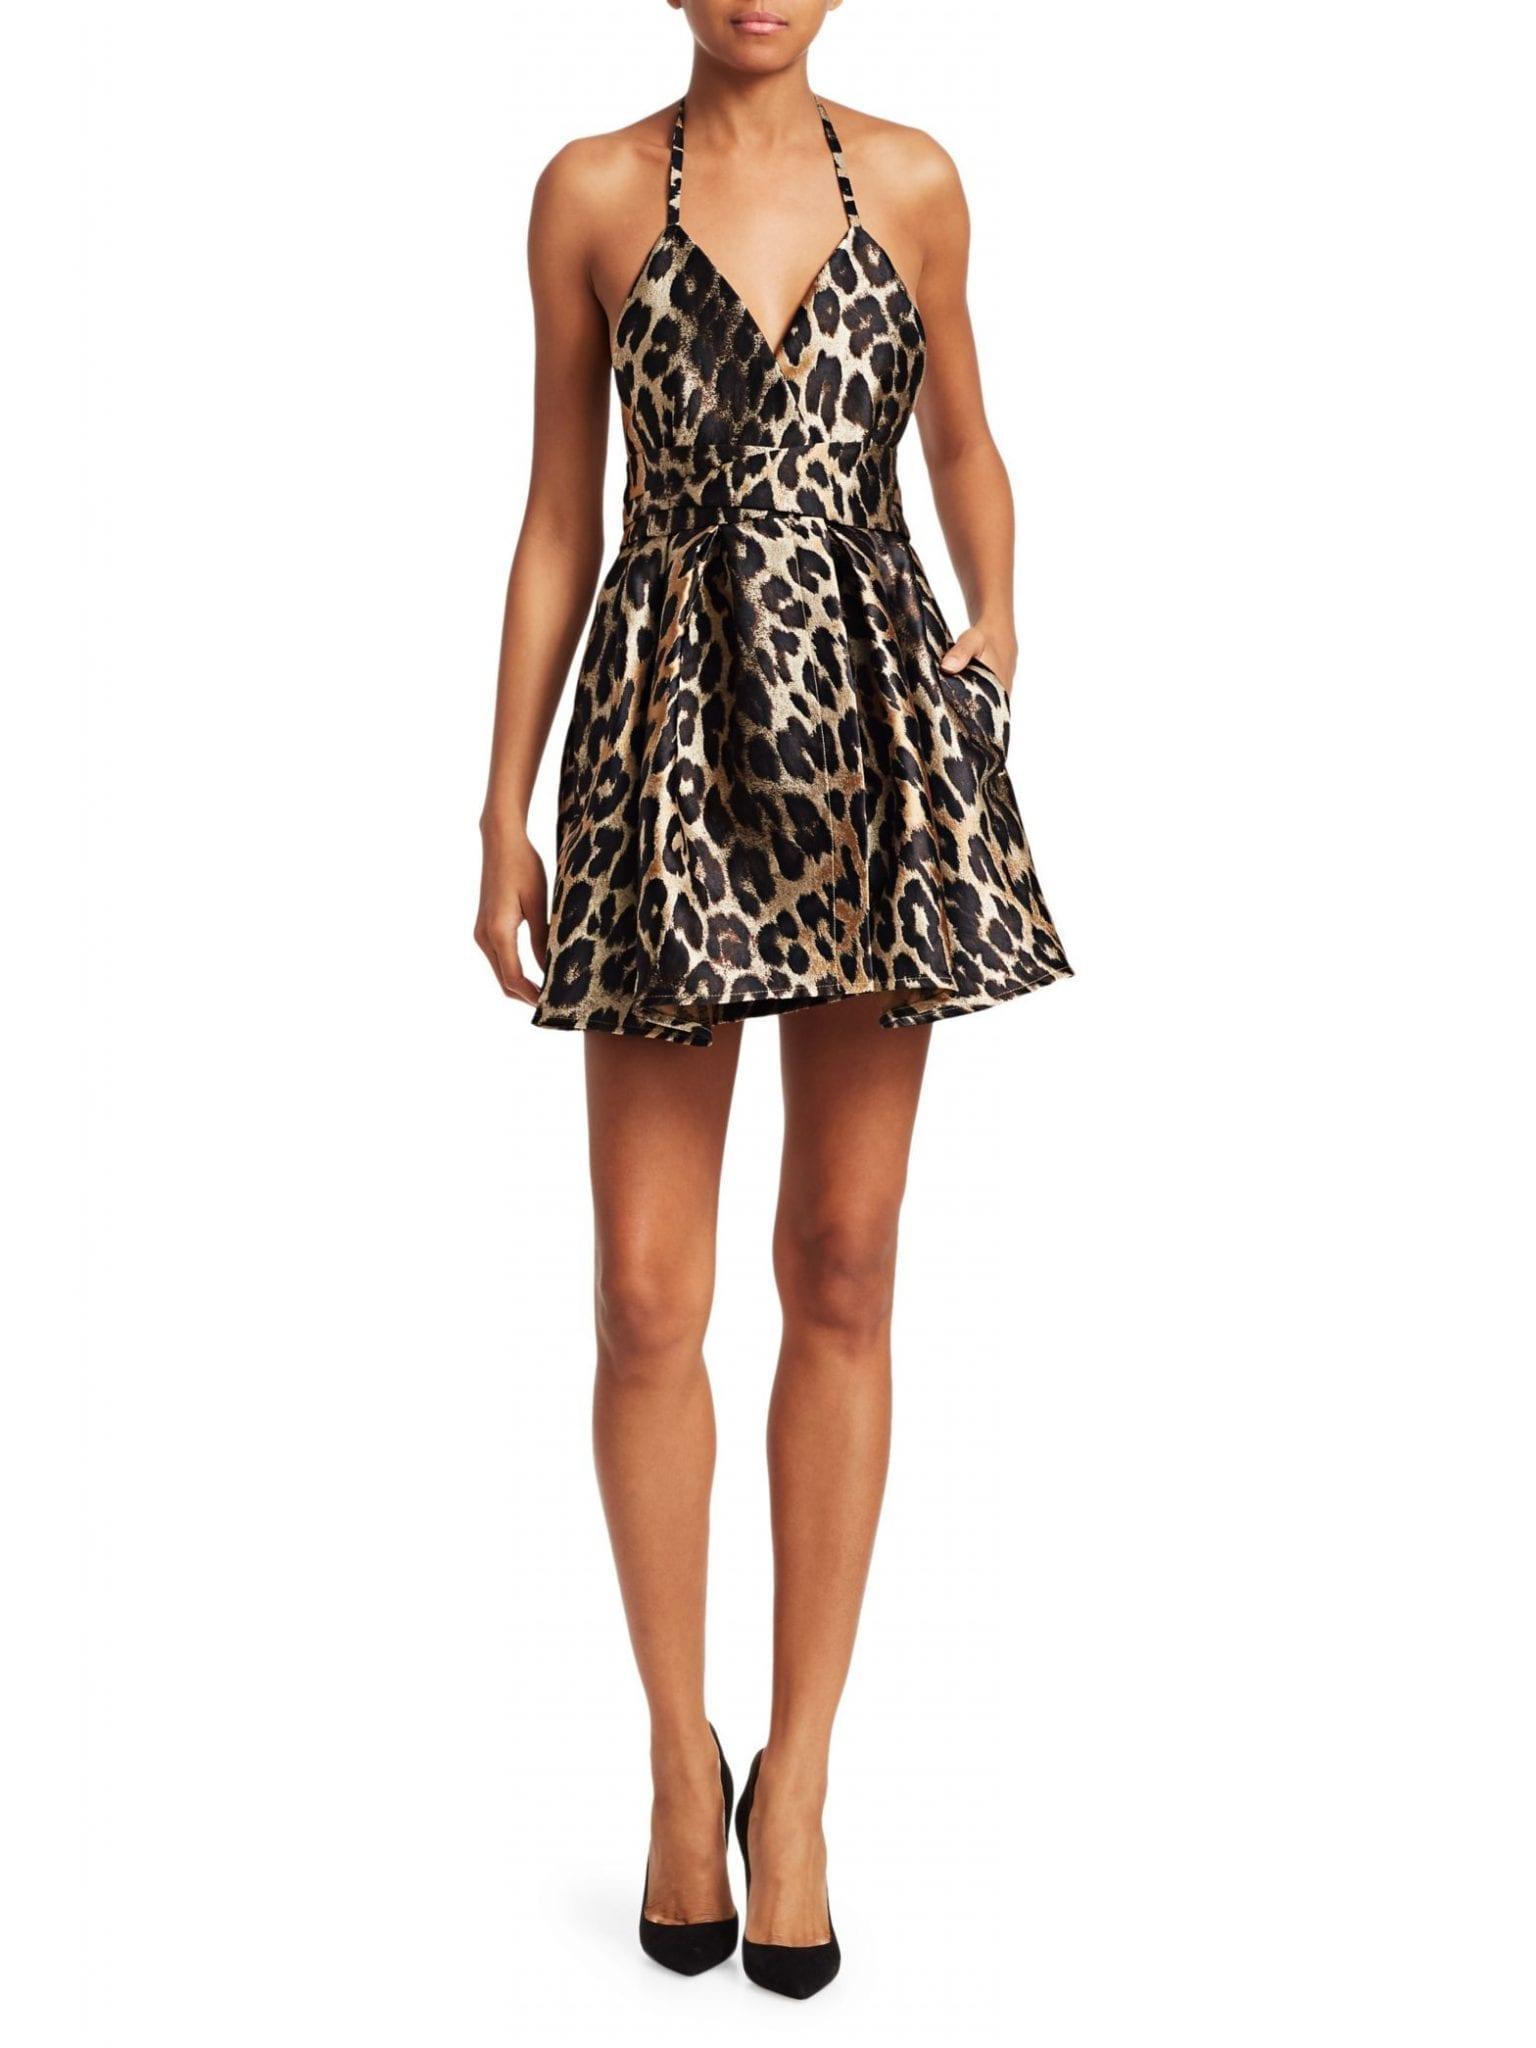 TRE BY NATALIE RATABESI The Irie Leopard Dress